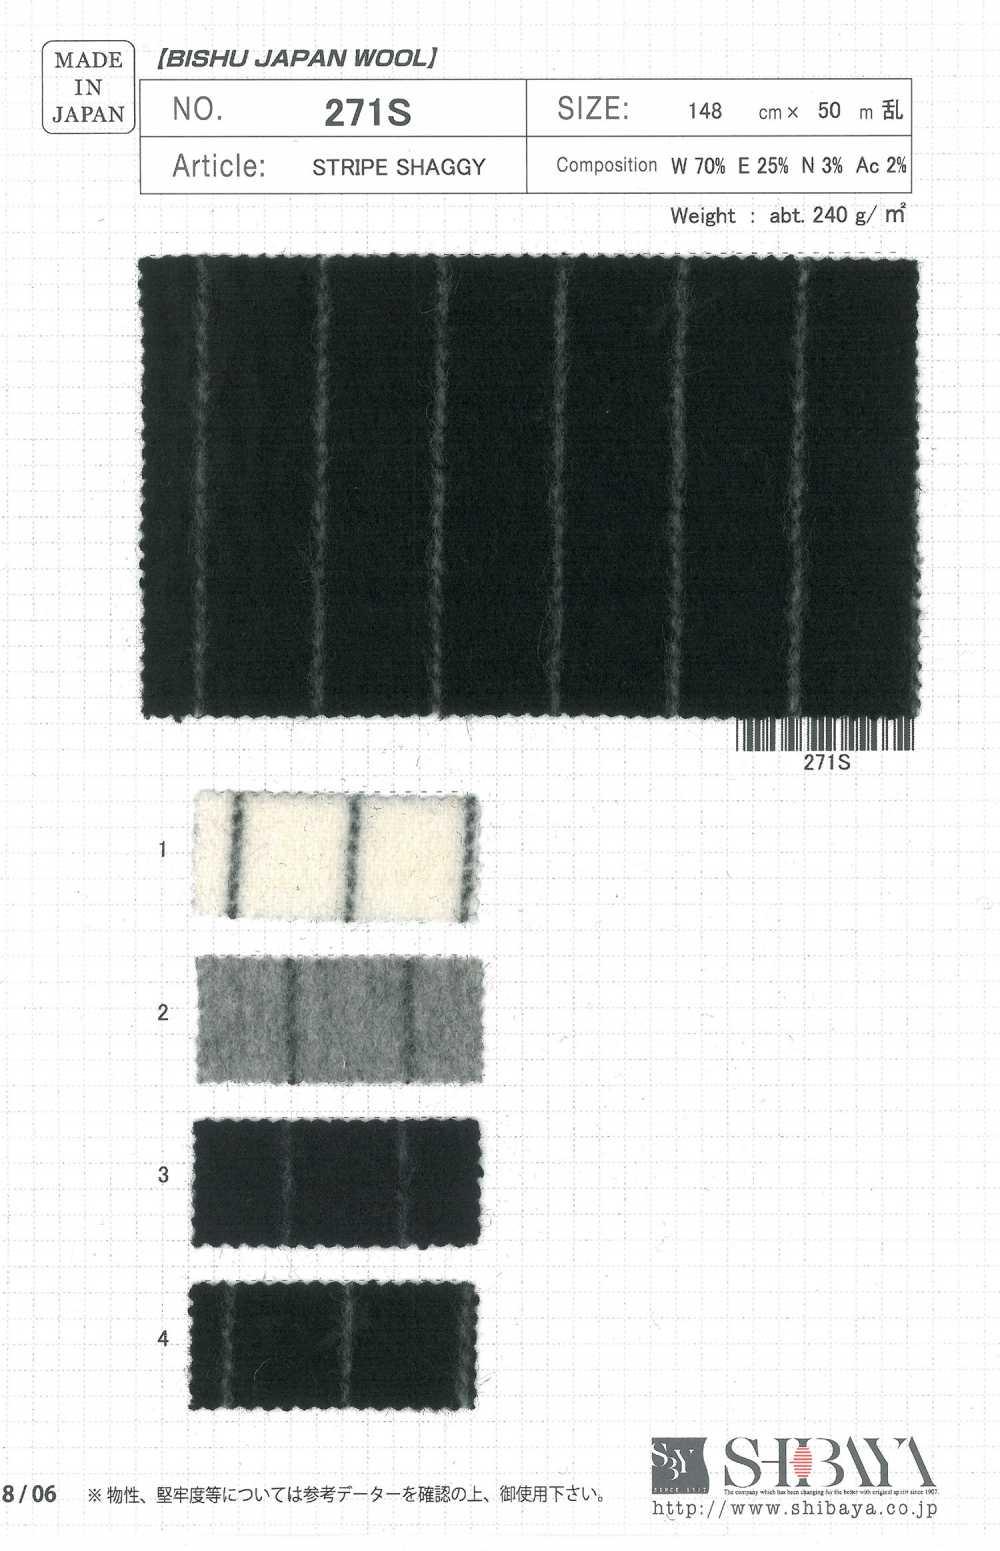 271S STRIPE SHAGGY[生地] 柴屋/オークラ商事 - ApparelX アパレル資材卸通販